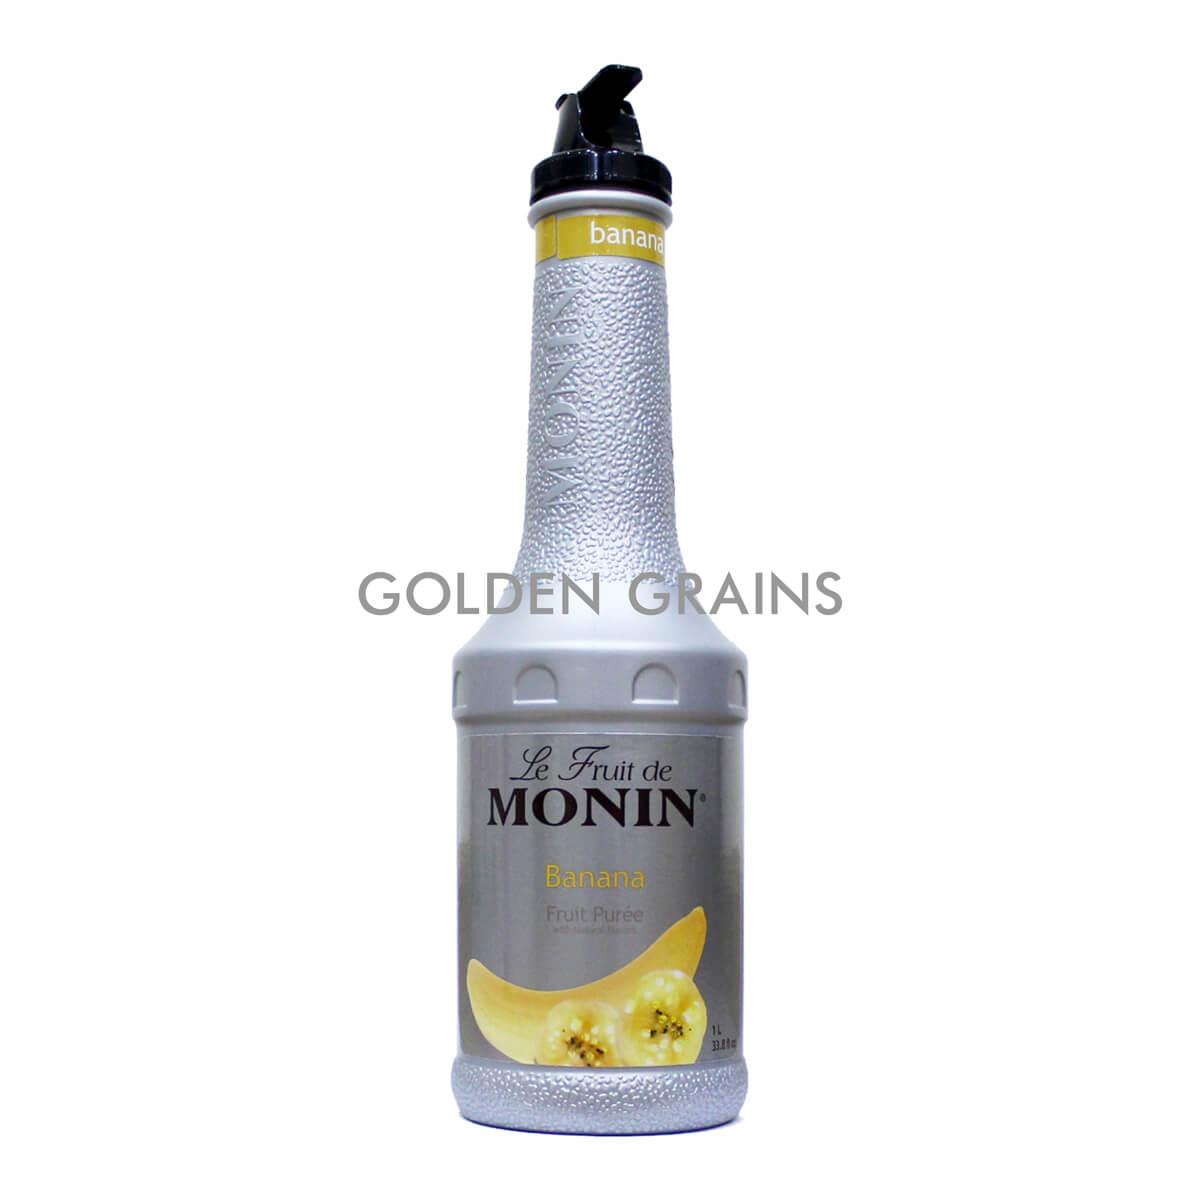 Golden Grains Monin - Banana Puree - Front.jpg